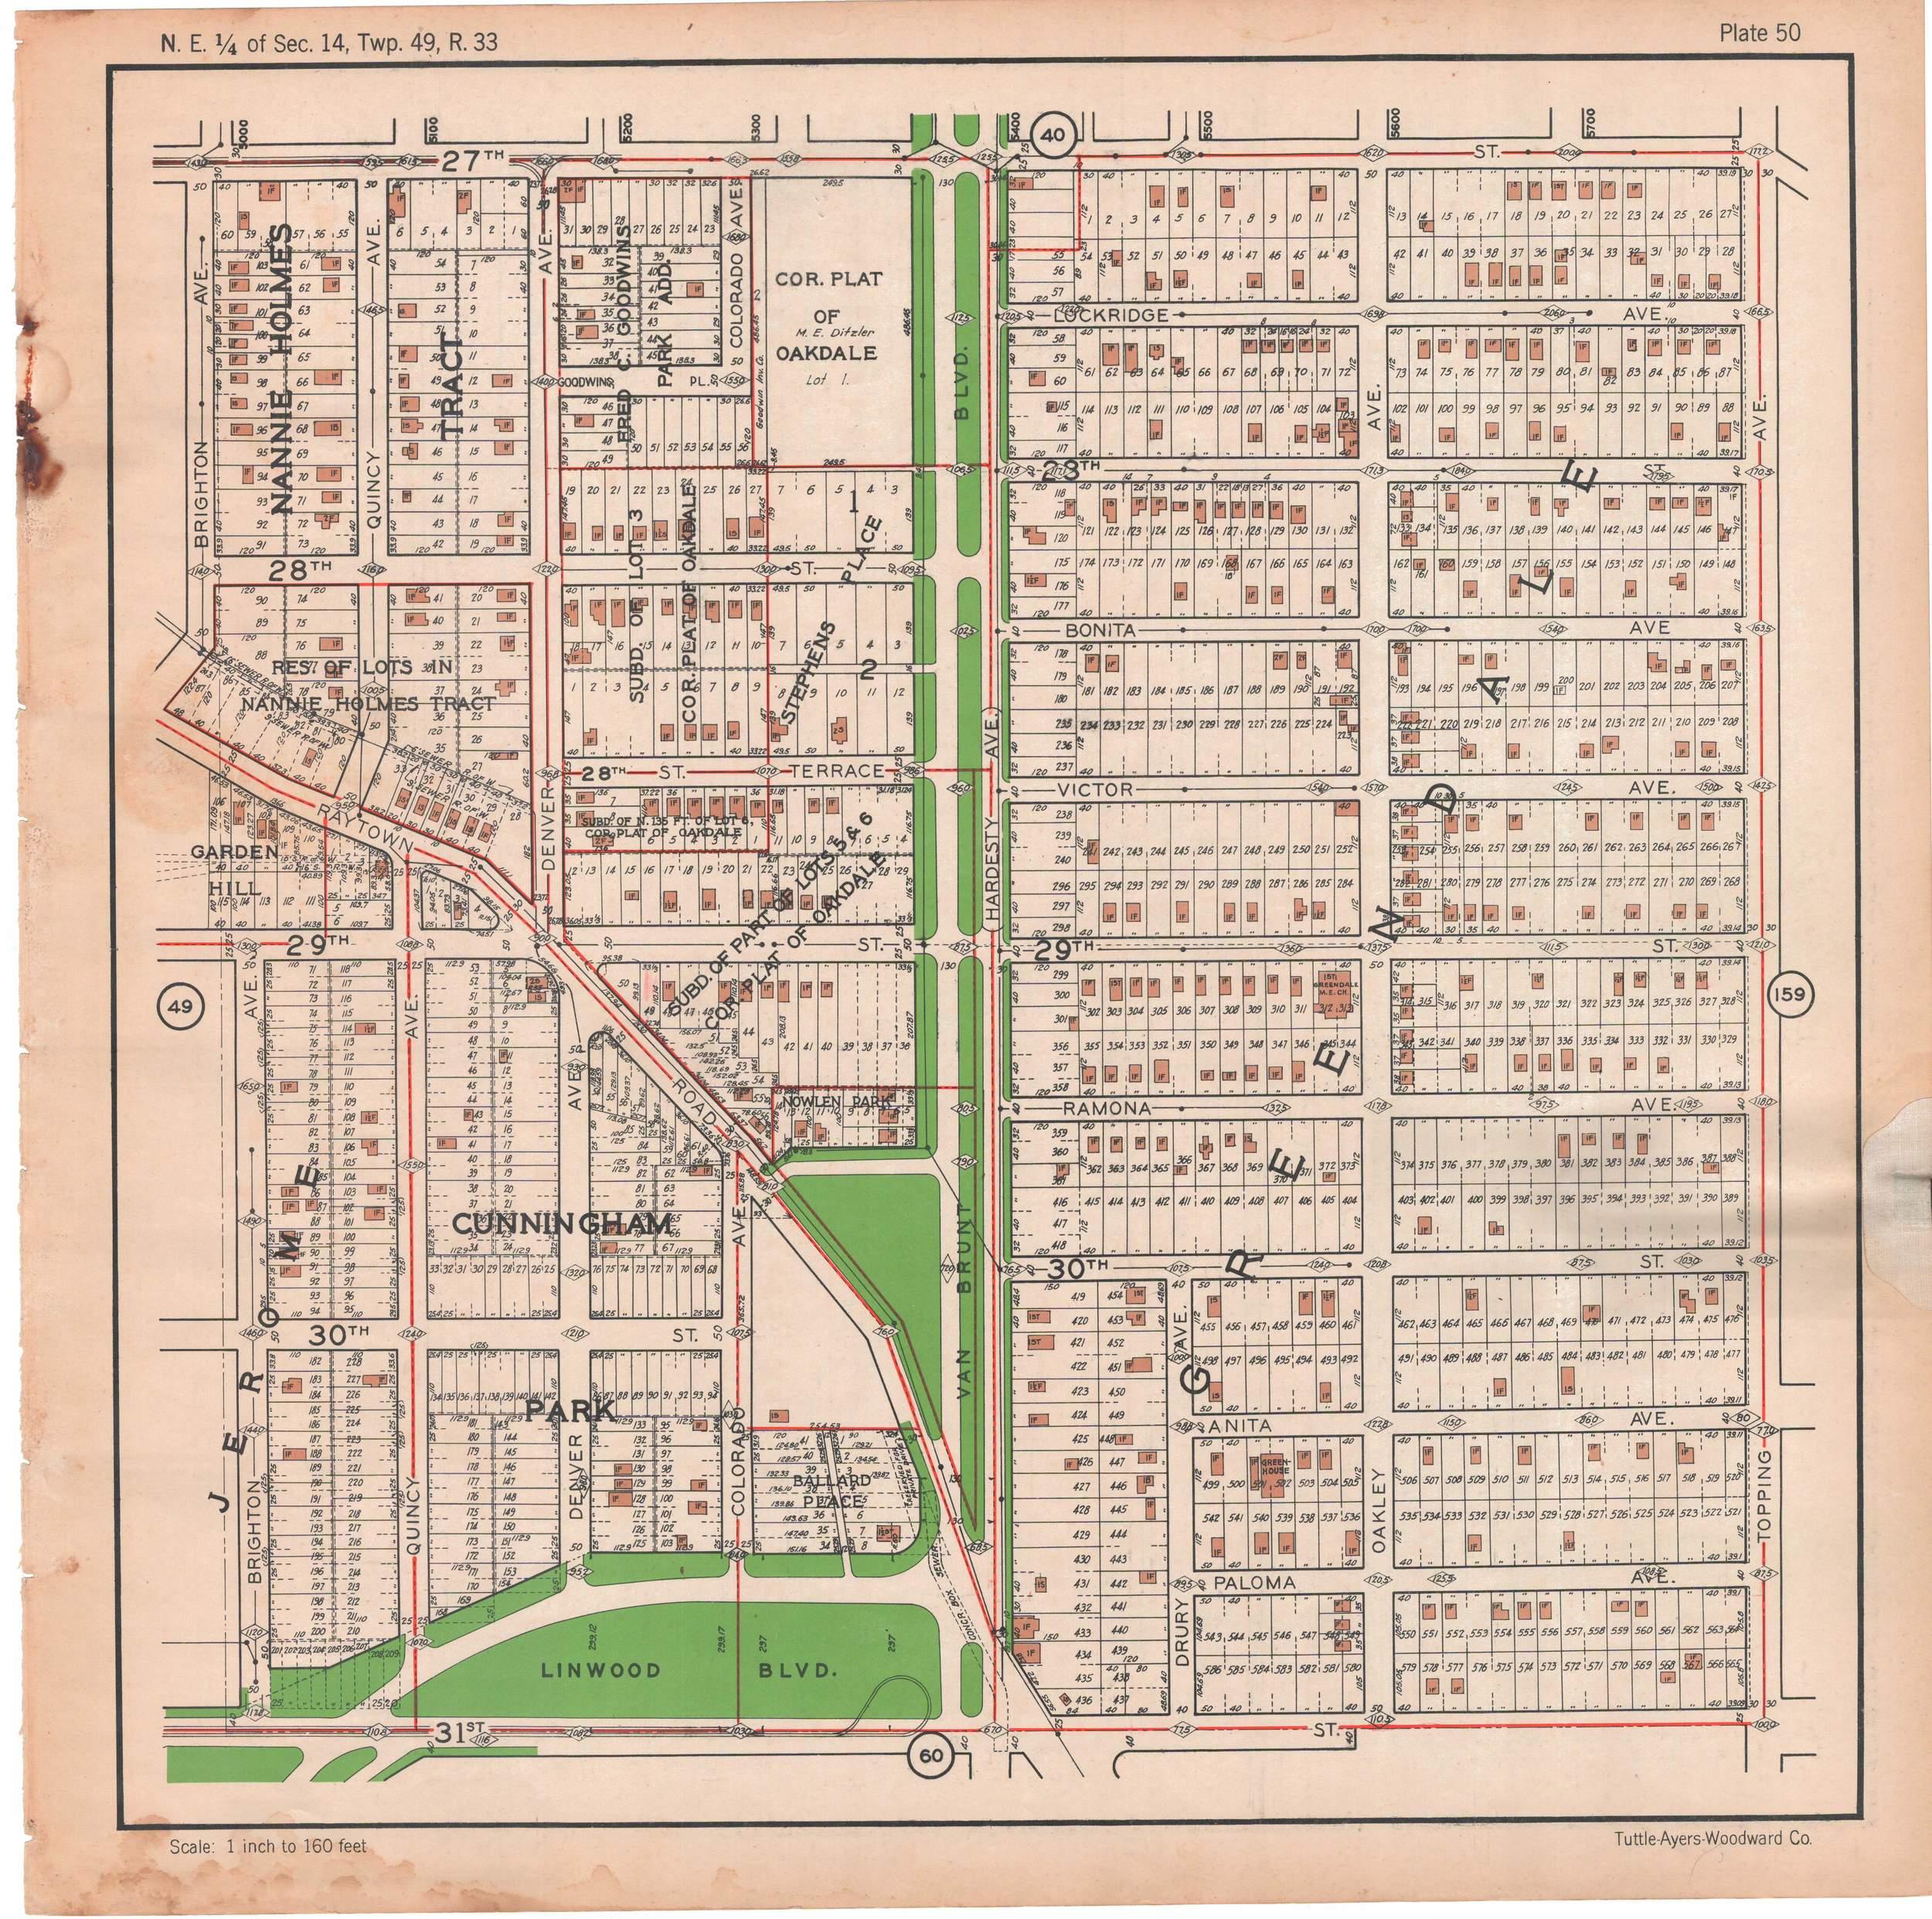 1925 TUTTLE_AYERS_Plate 50.JPG